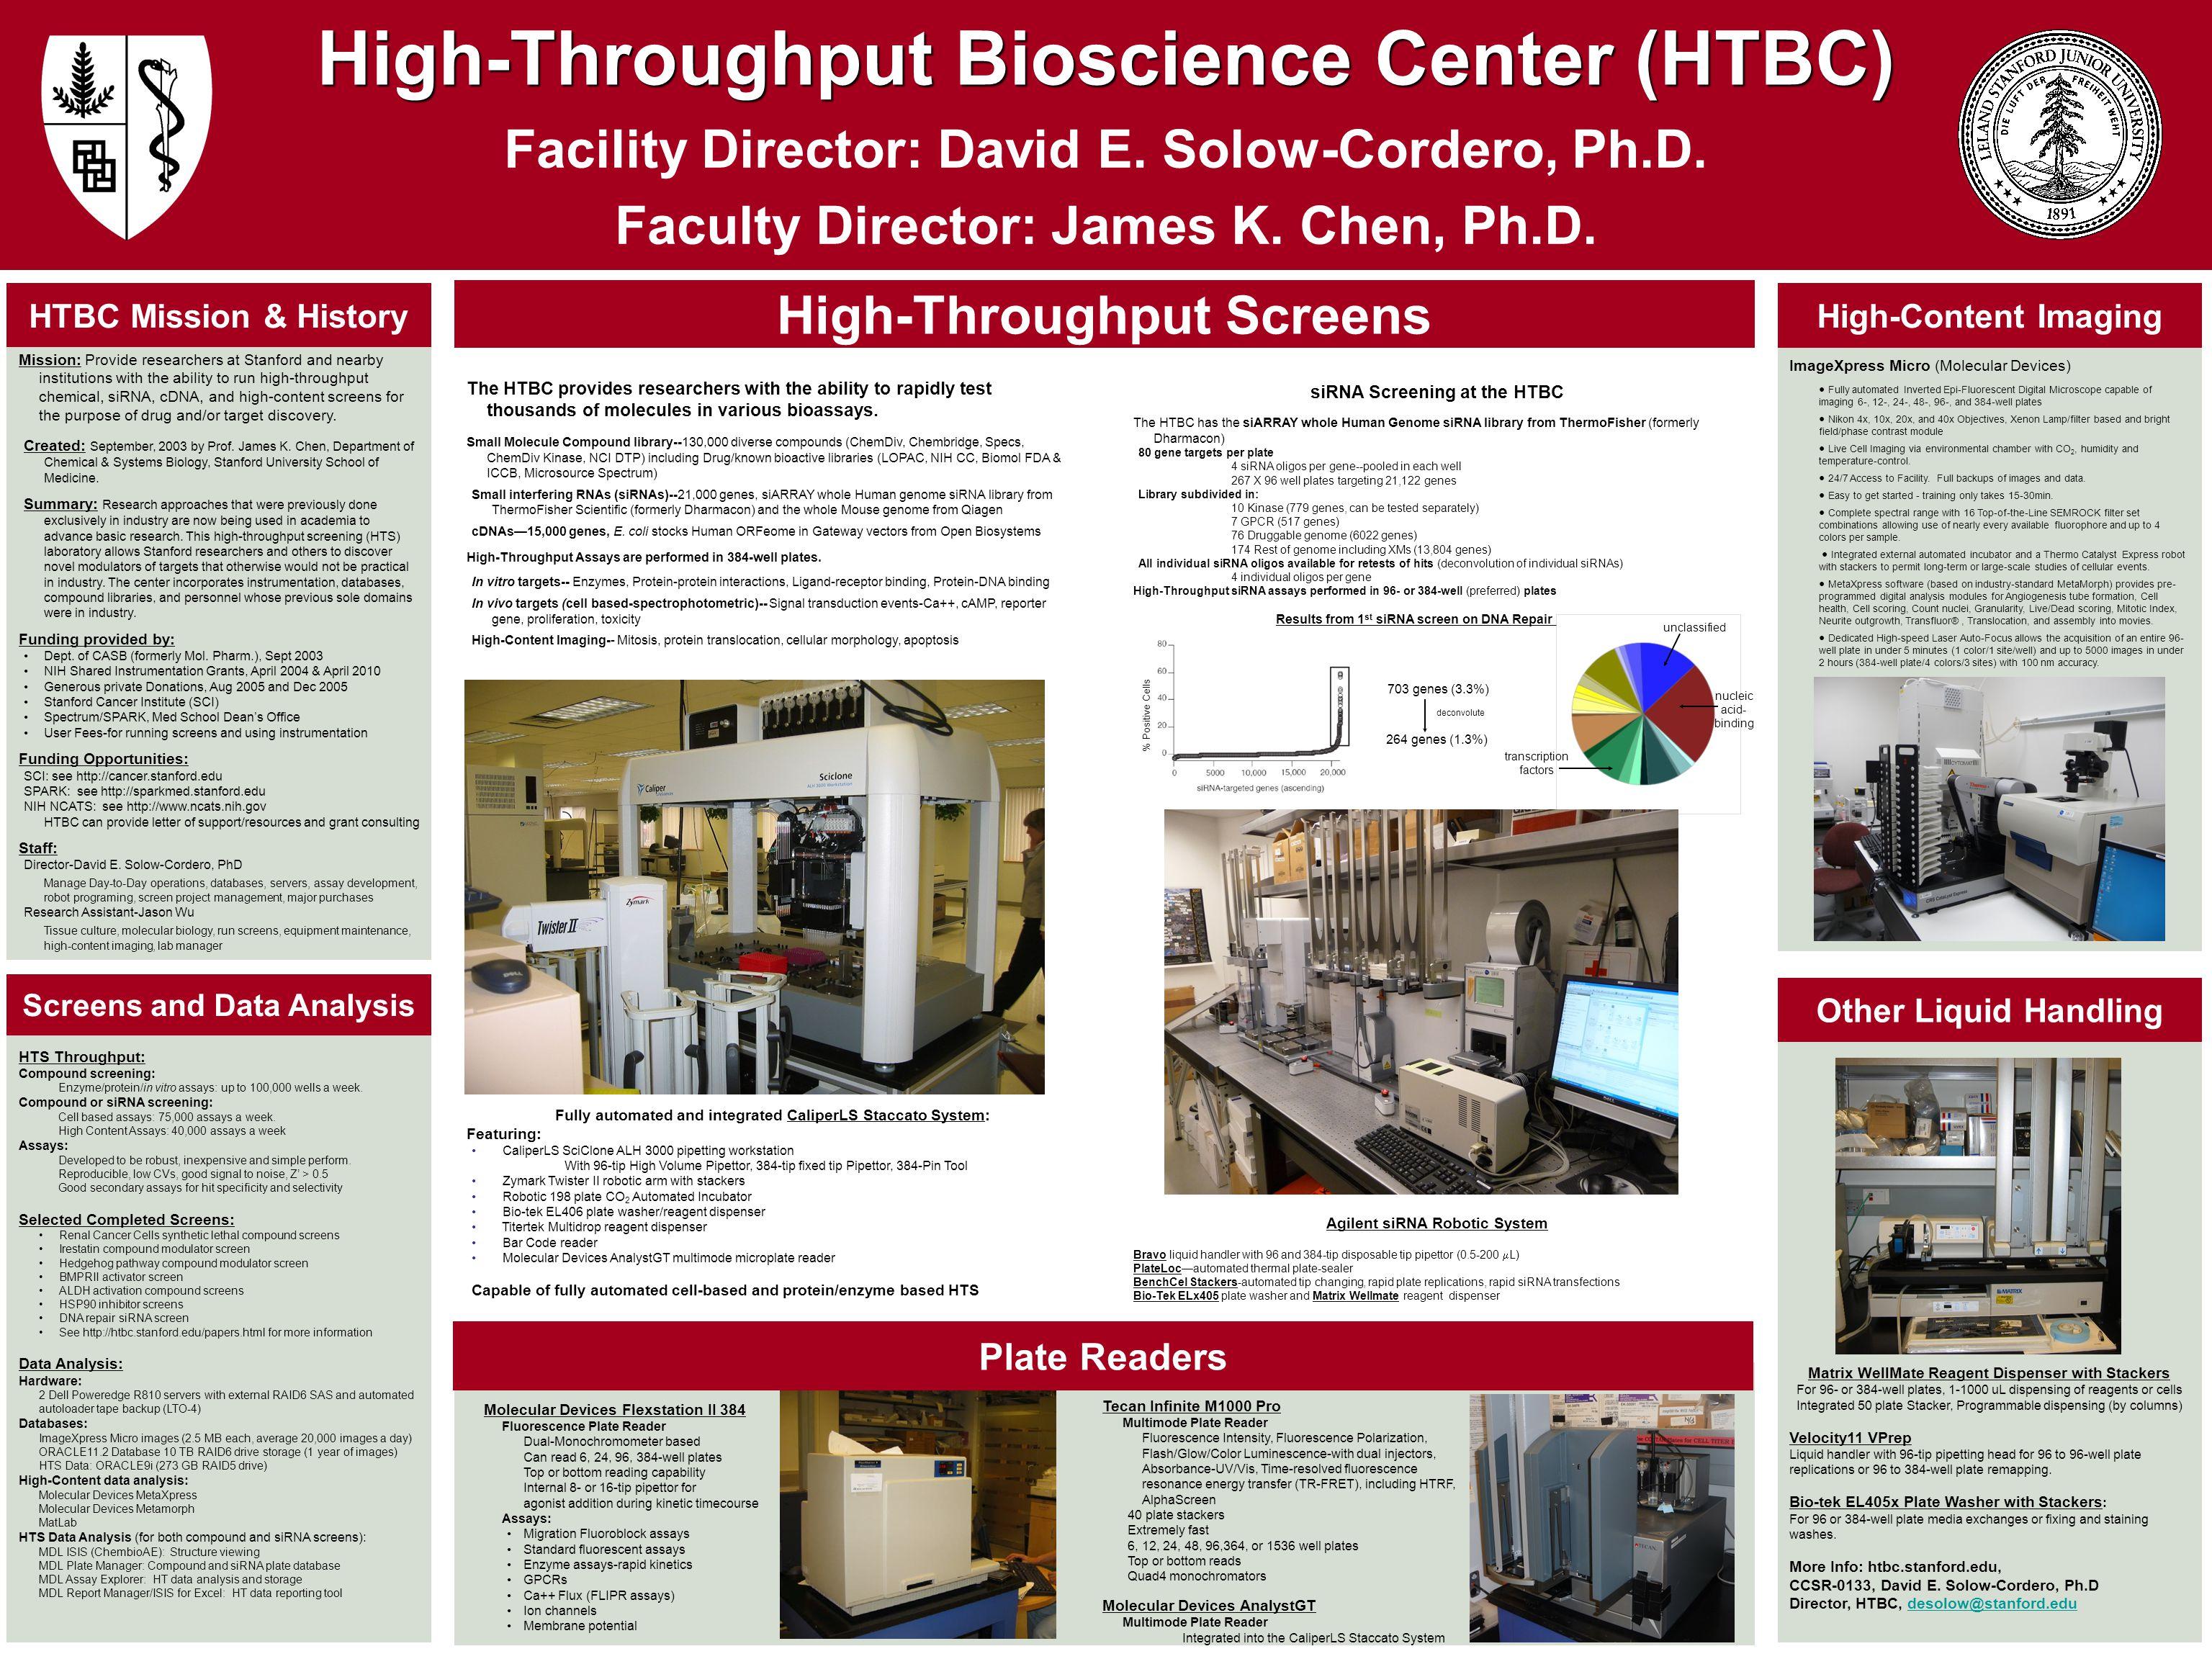 High-Throughput Bioscience Center (HTBC) Facility Director: David E.